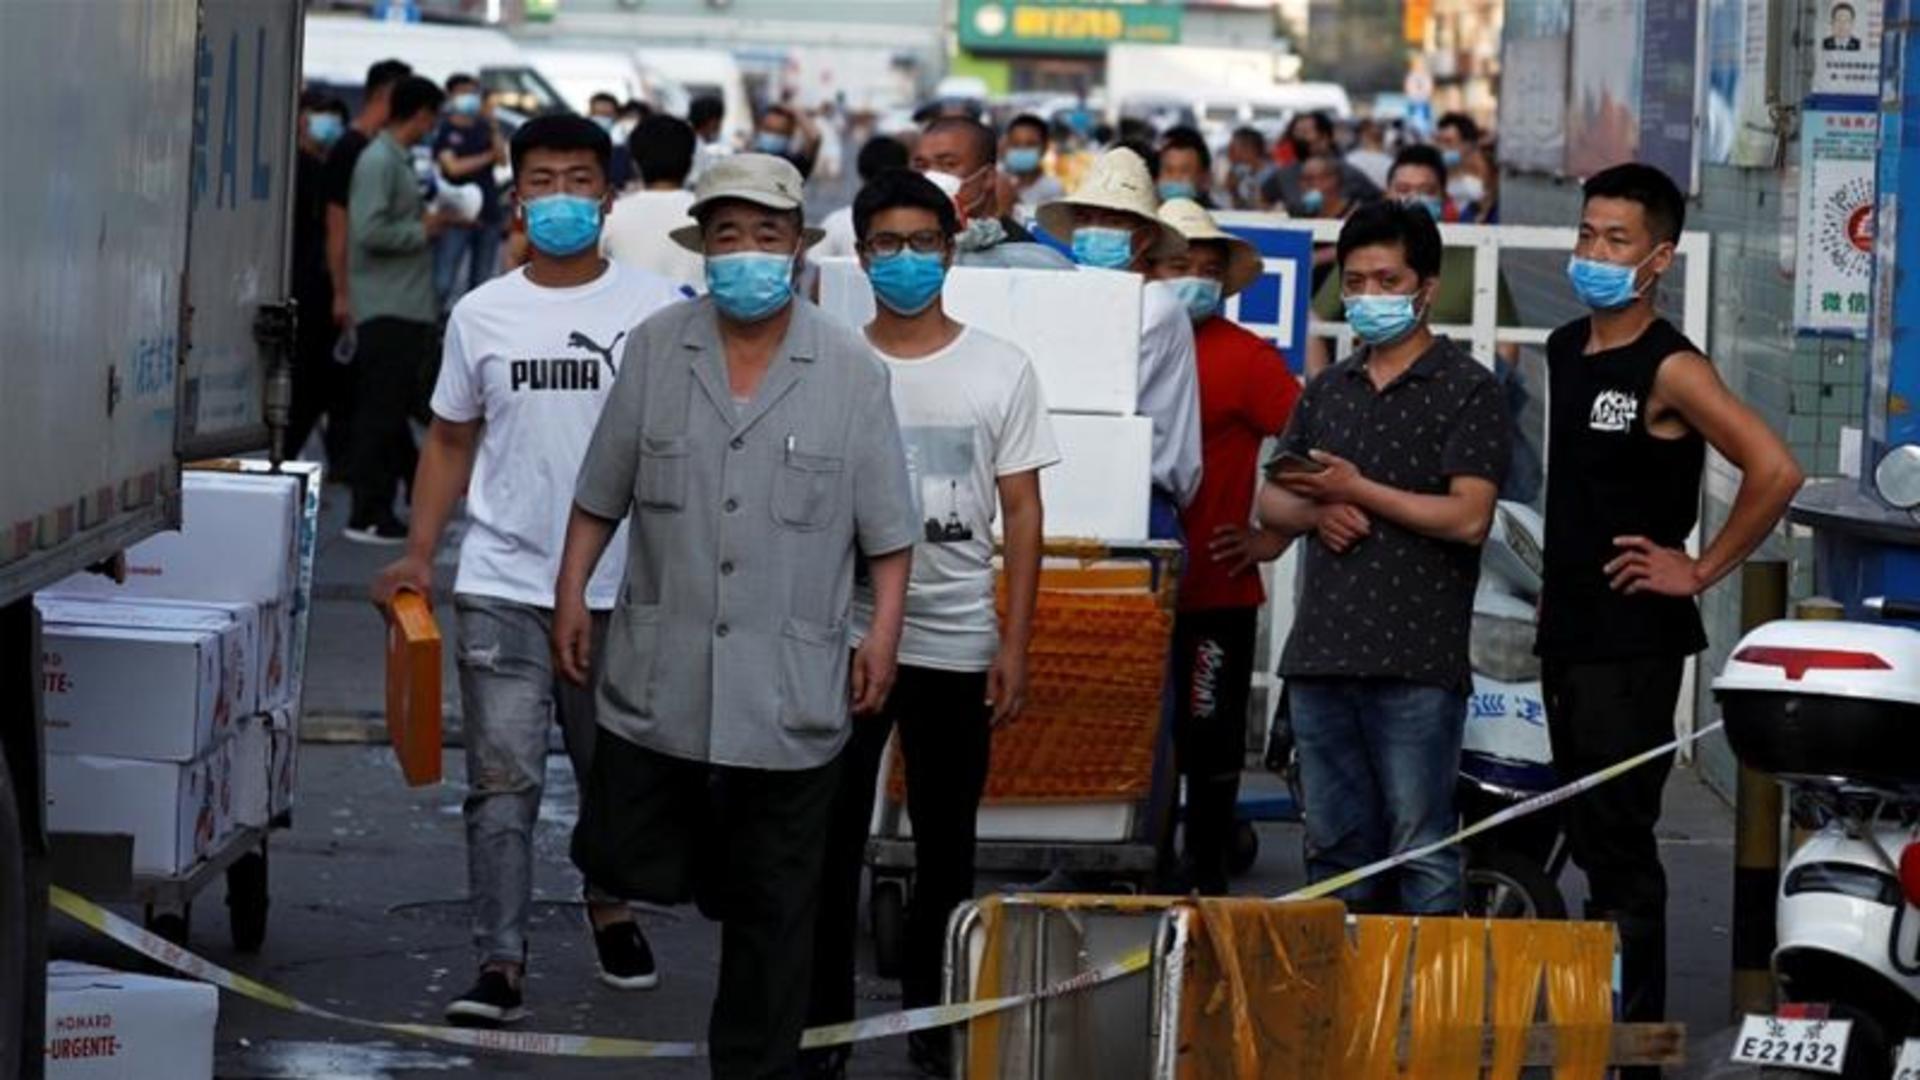 Beijing district in 'wartime mode' amid fresh coronavirus cases